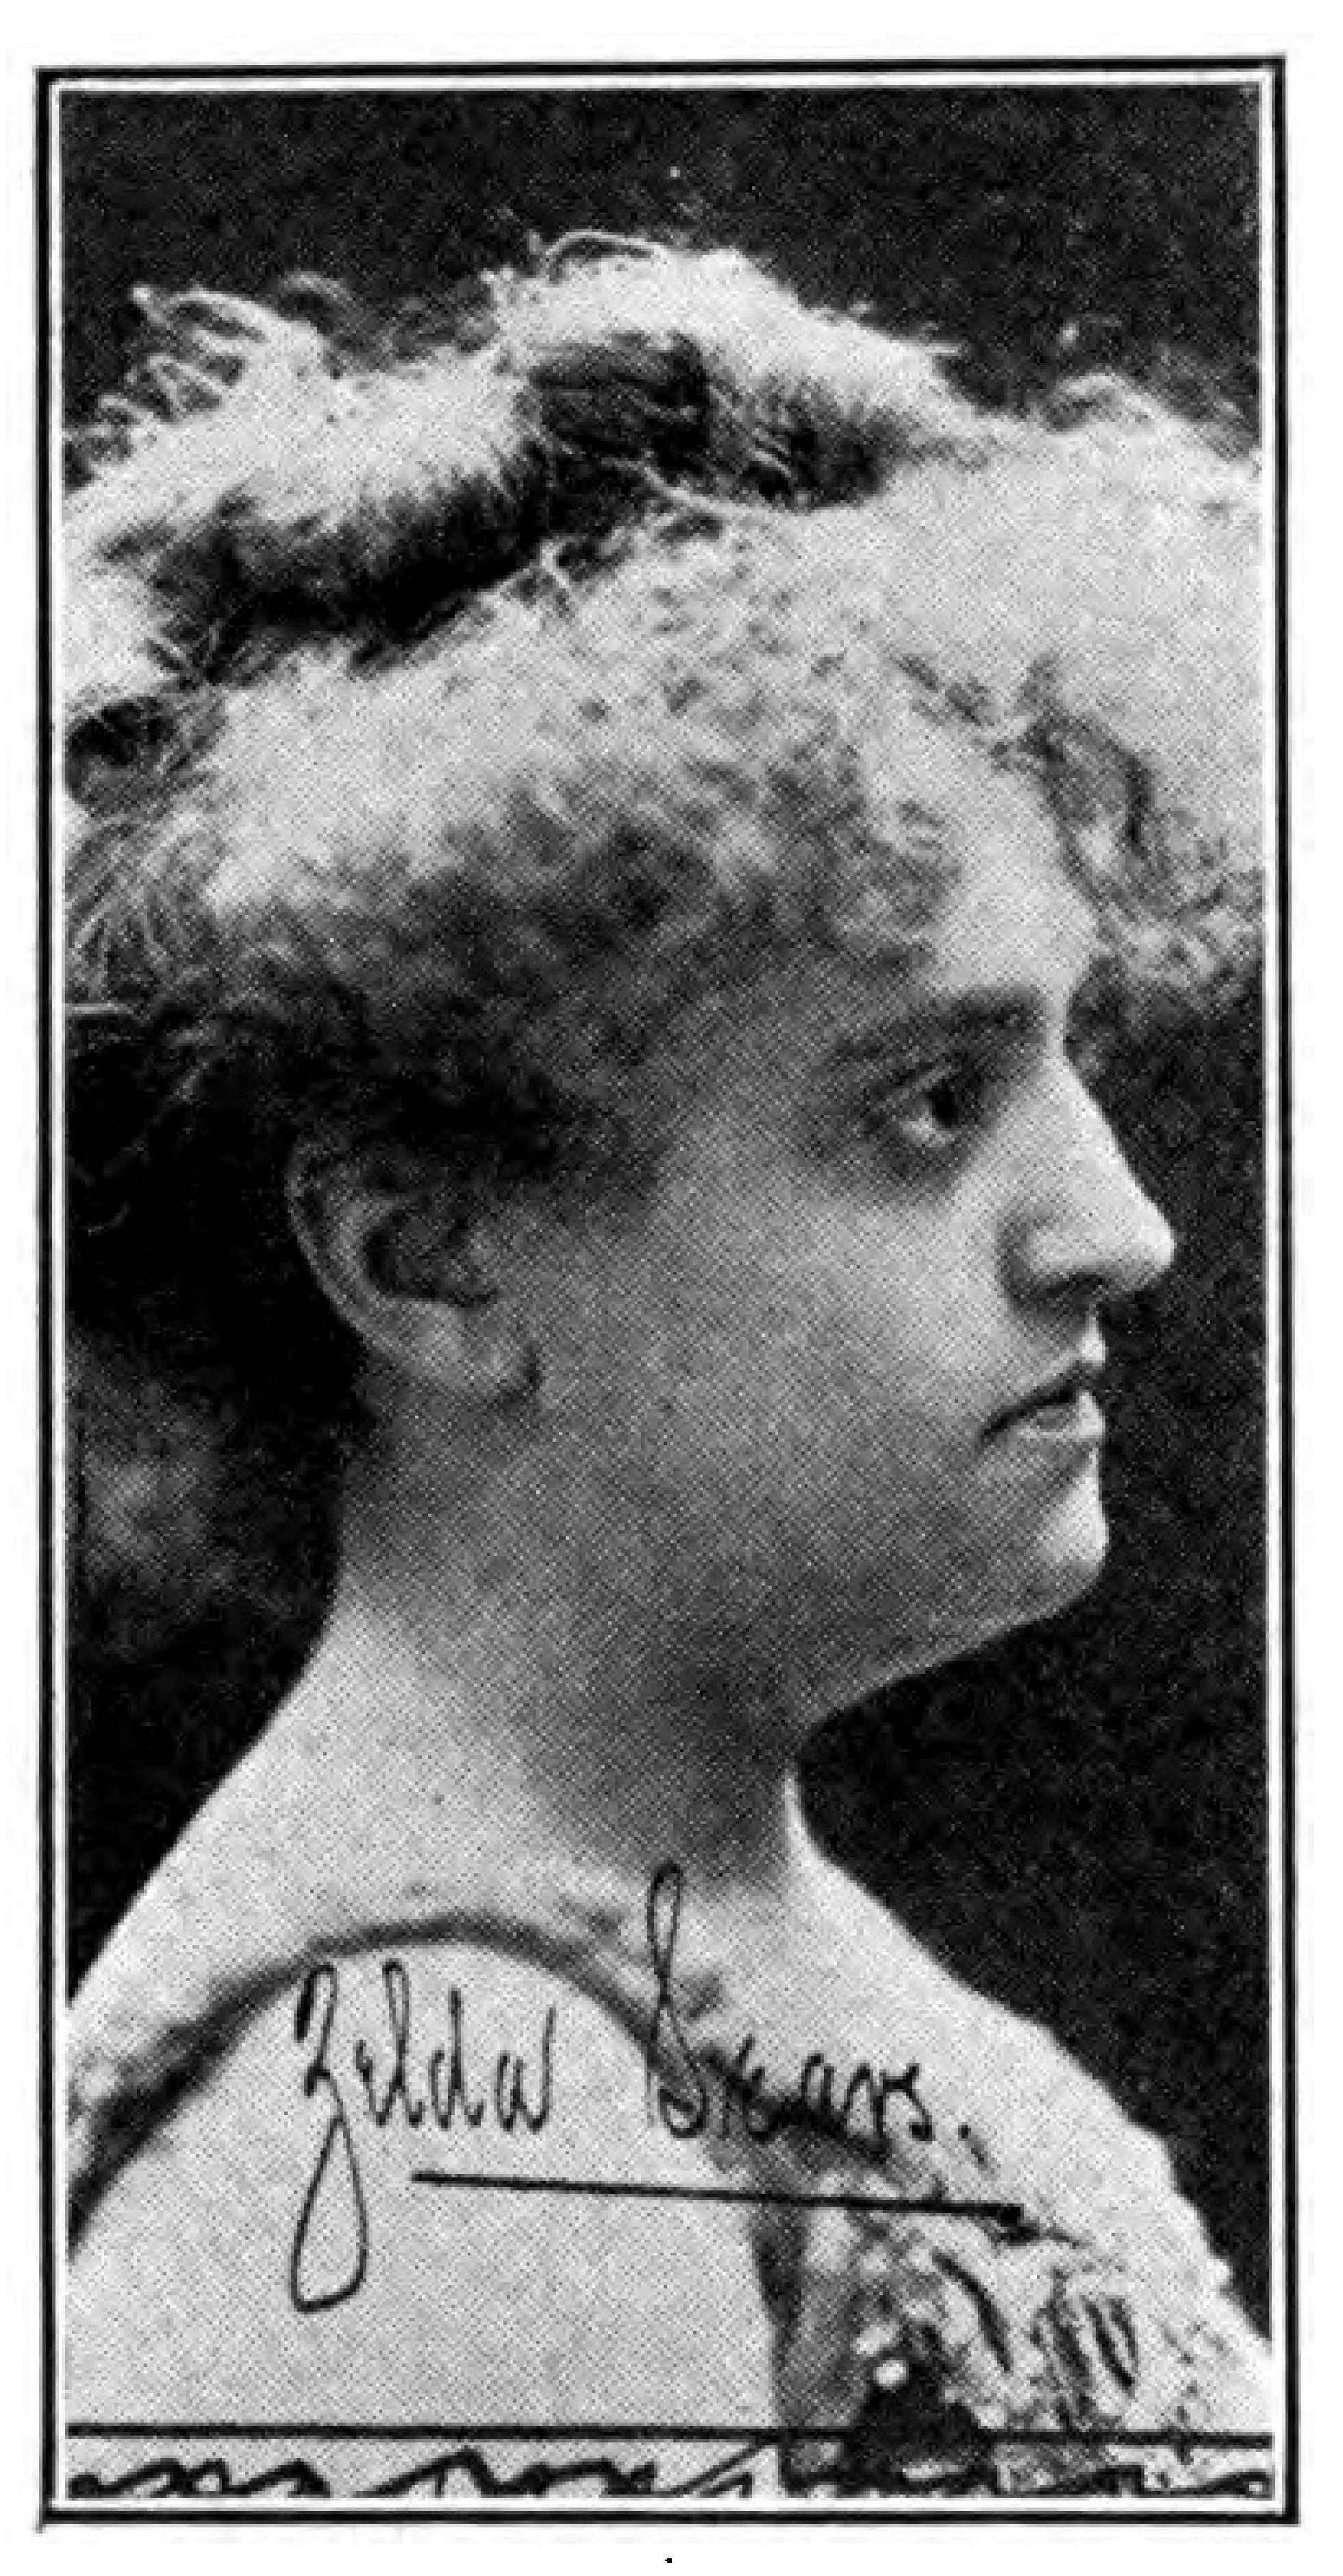 Zelda Sears